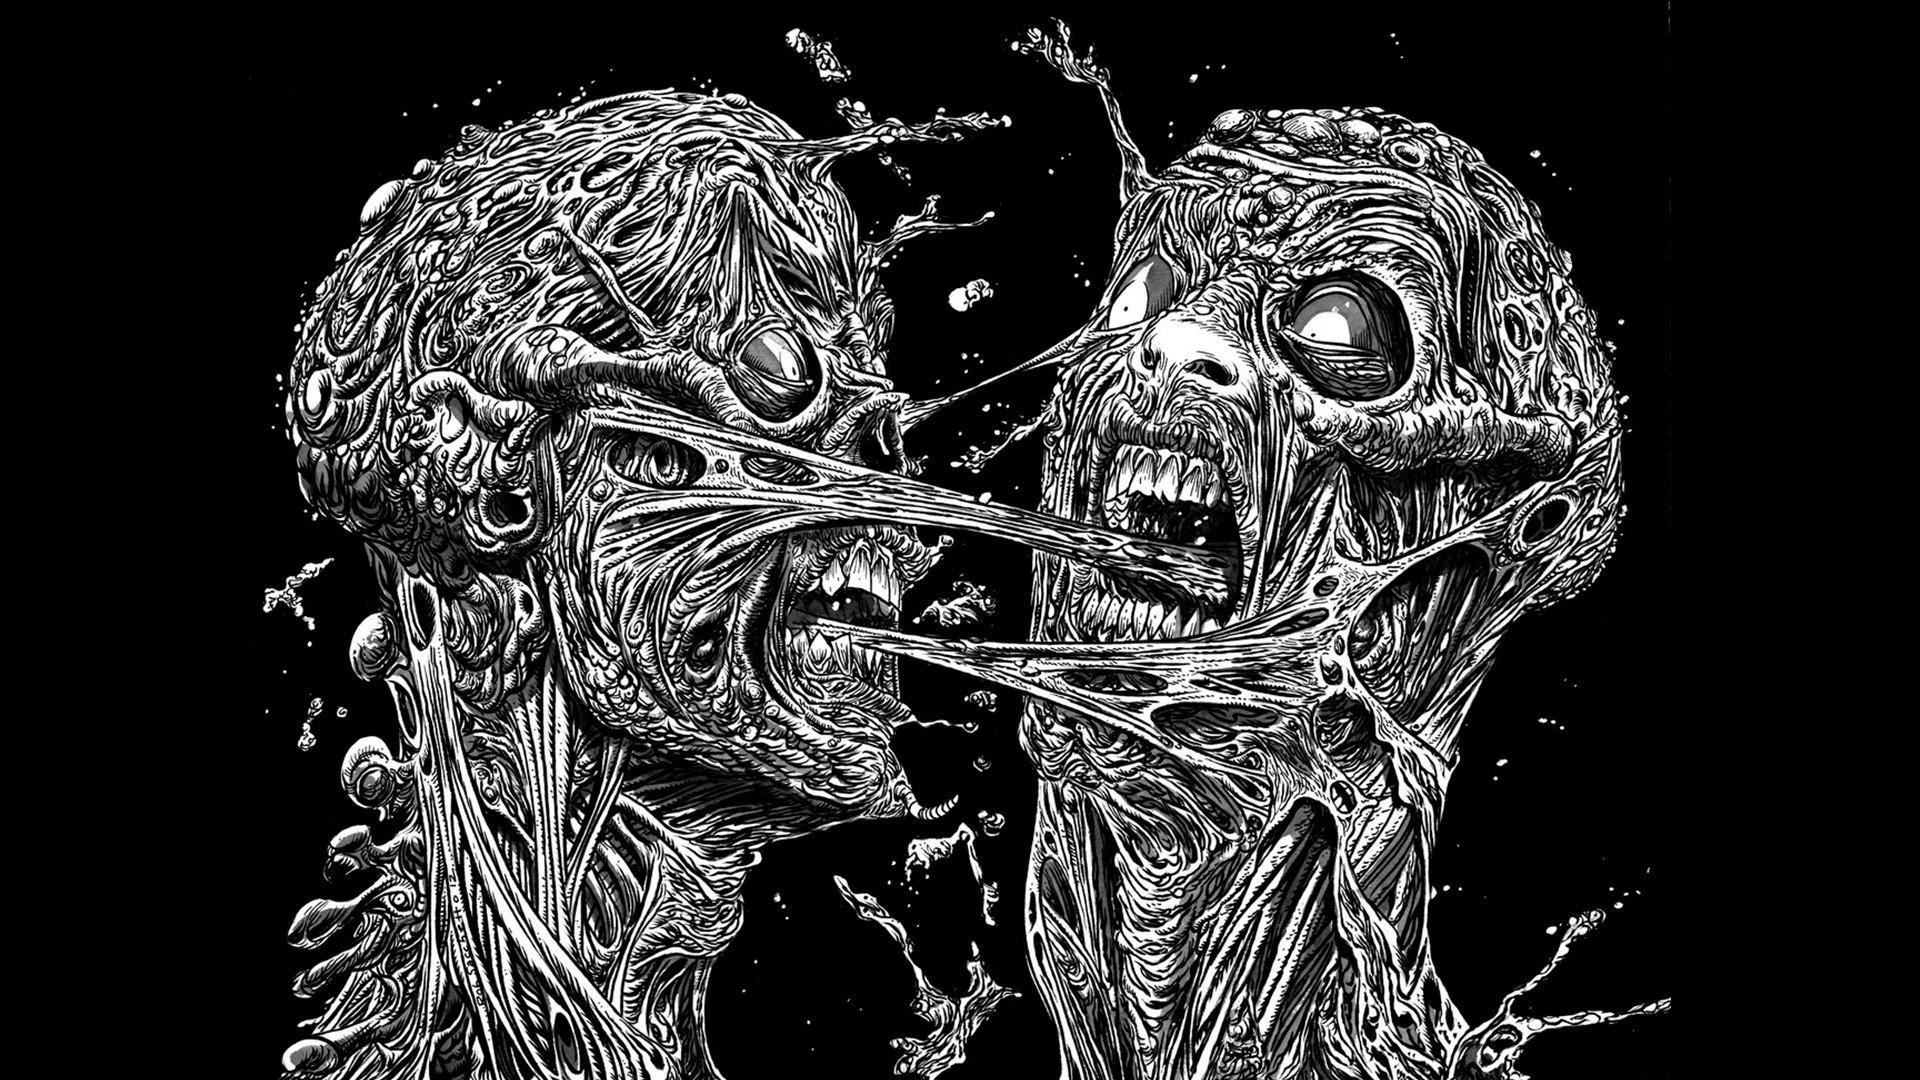 Zombie Art Wallpaper (78+ images)